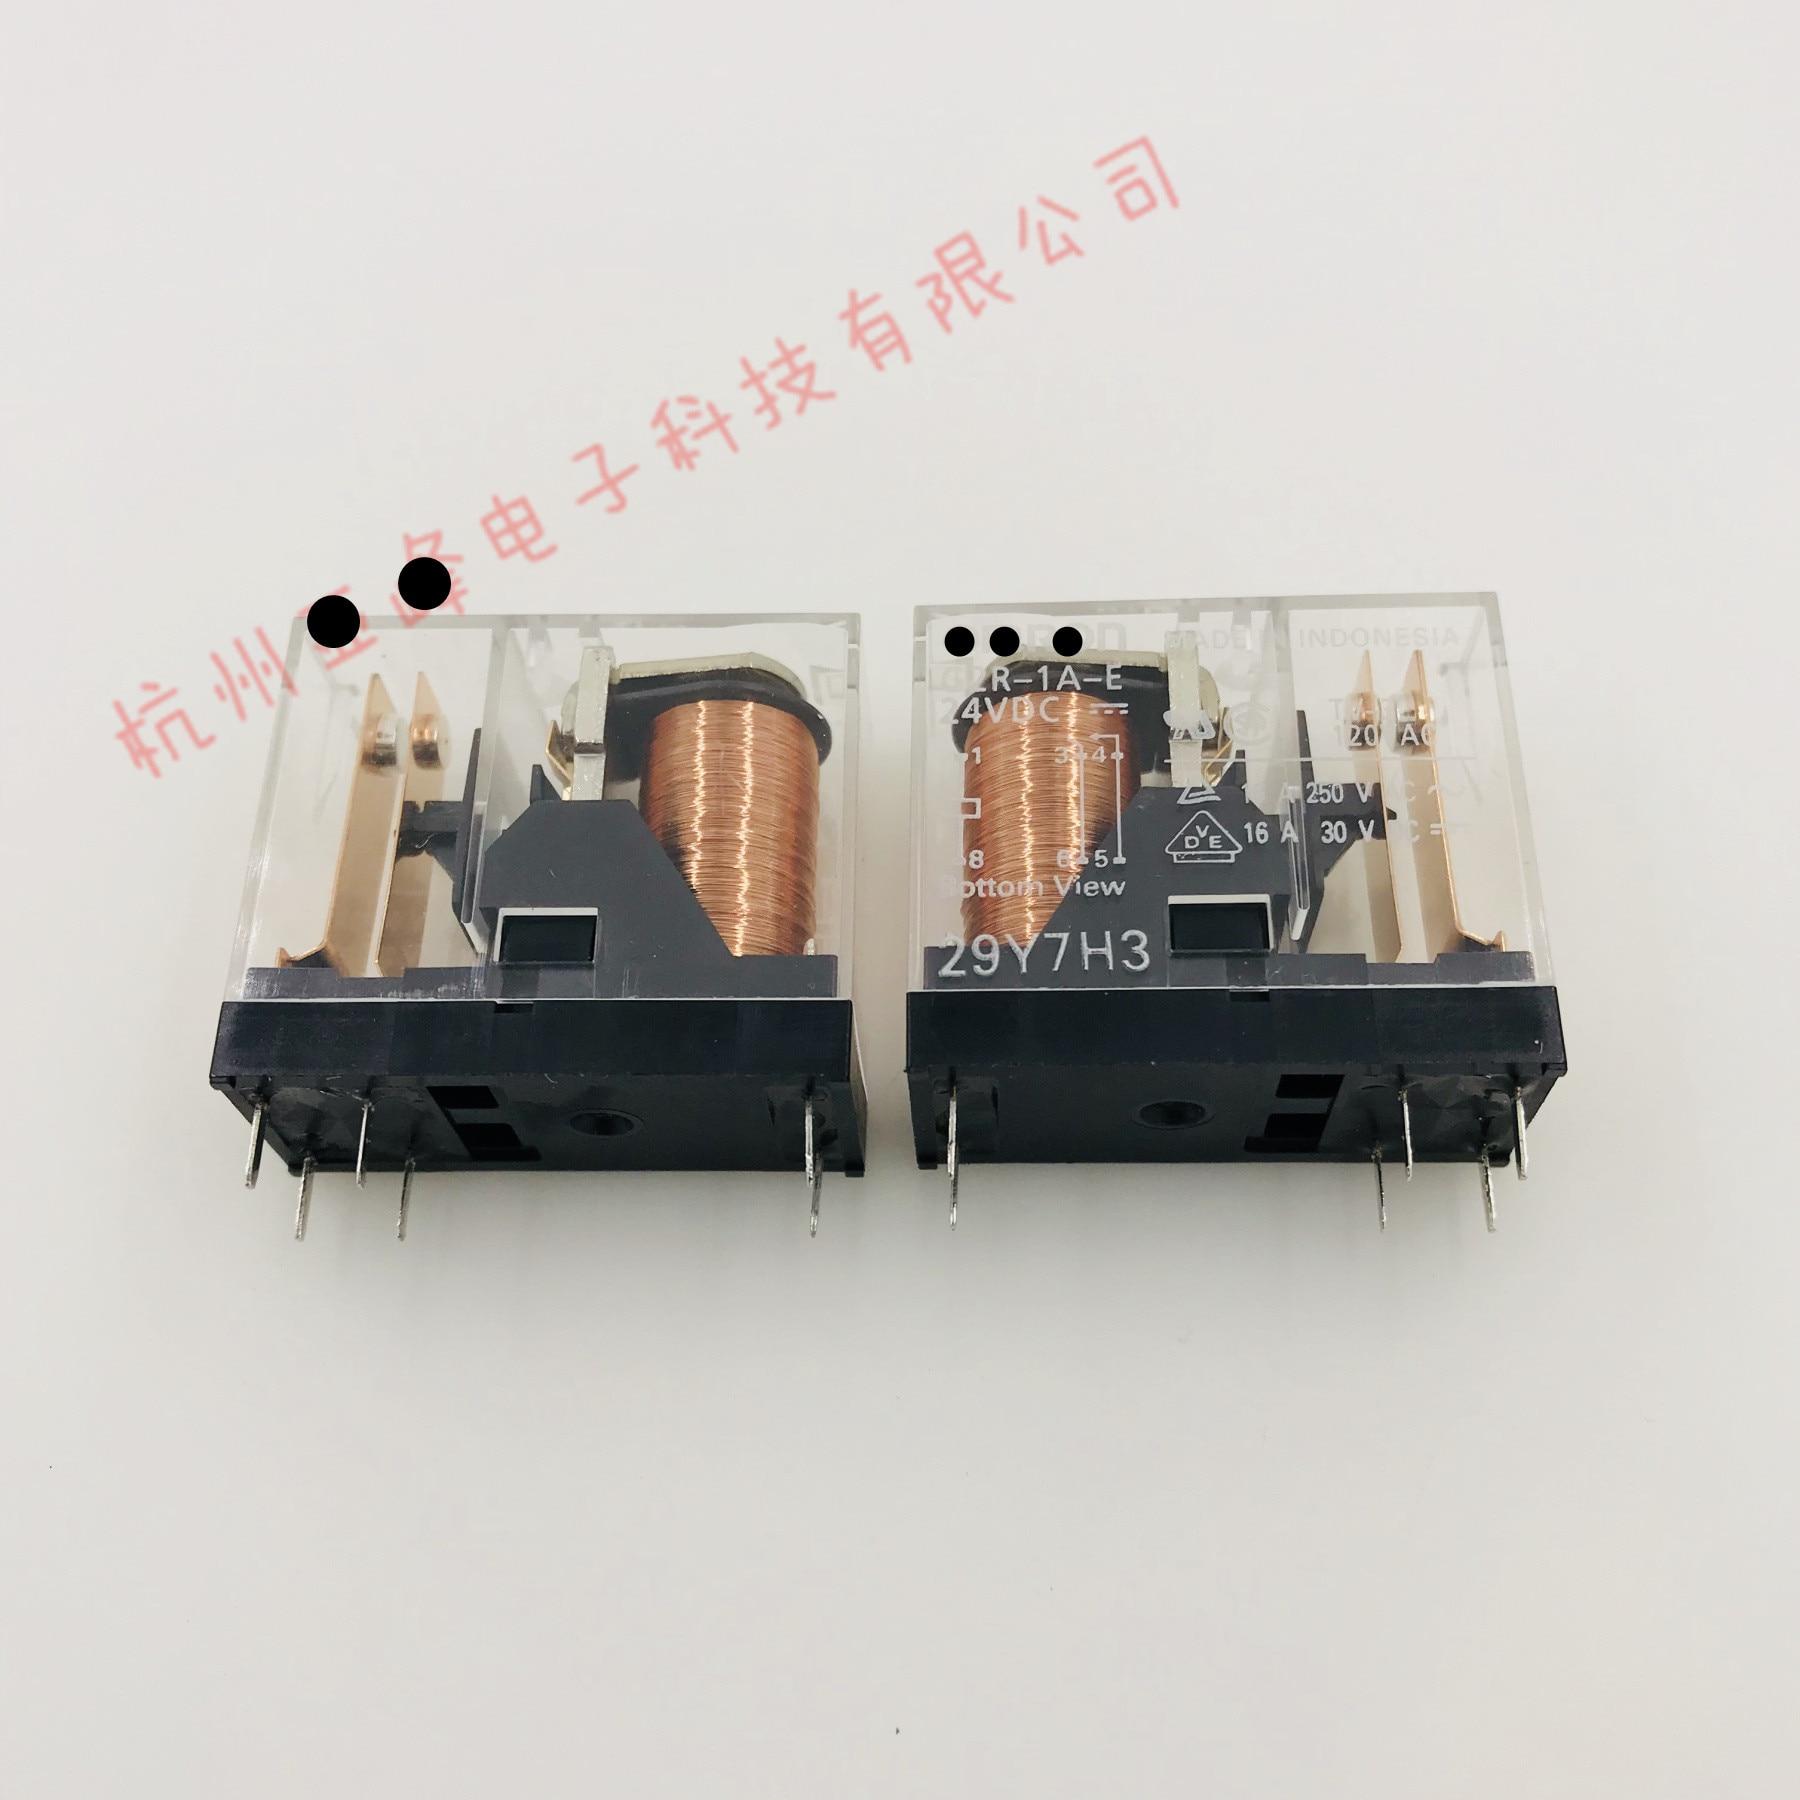 (10 peça) Relé G2R-1-E-12VDC G2R-1-E-24VDC G2R-1-E 12VDC G2R 1 E 12V 24V 8PIN 16A Novo